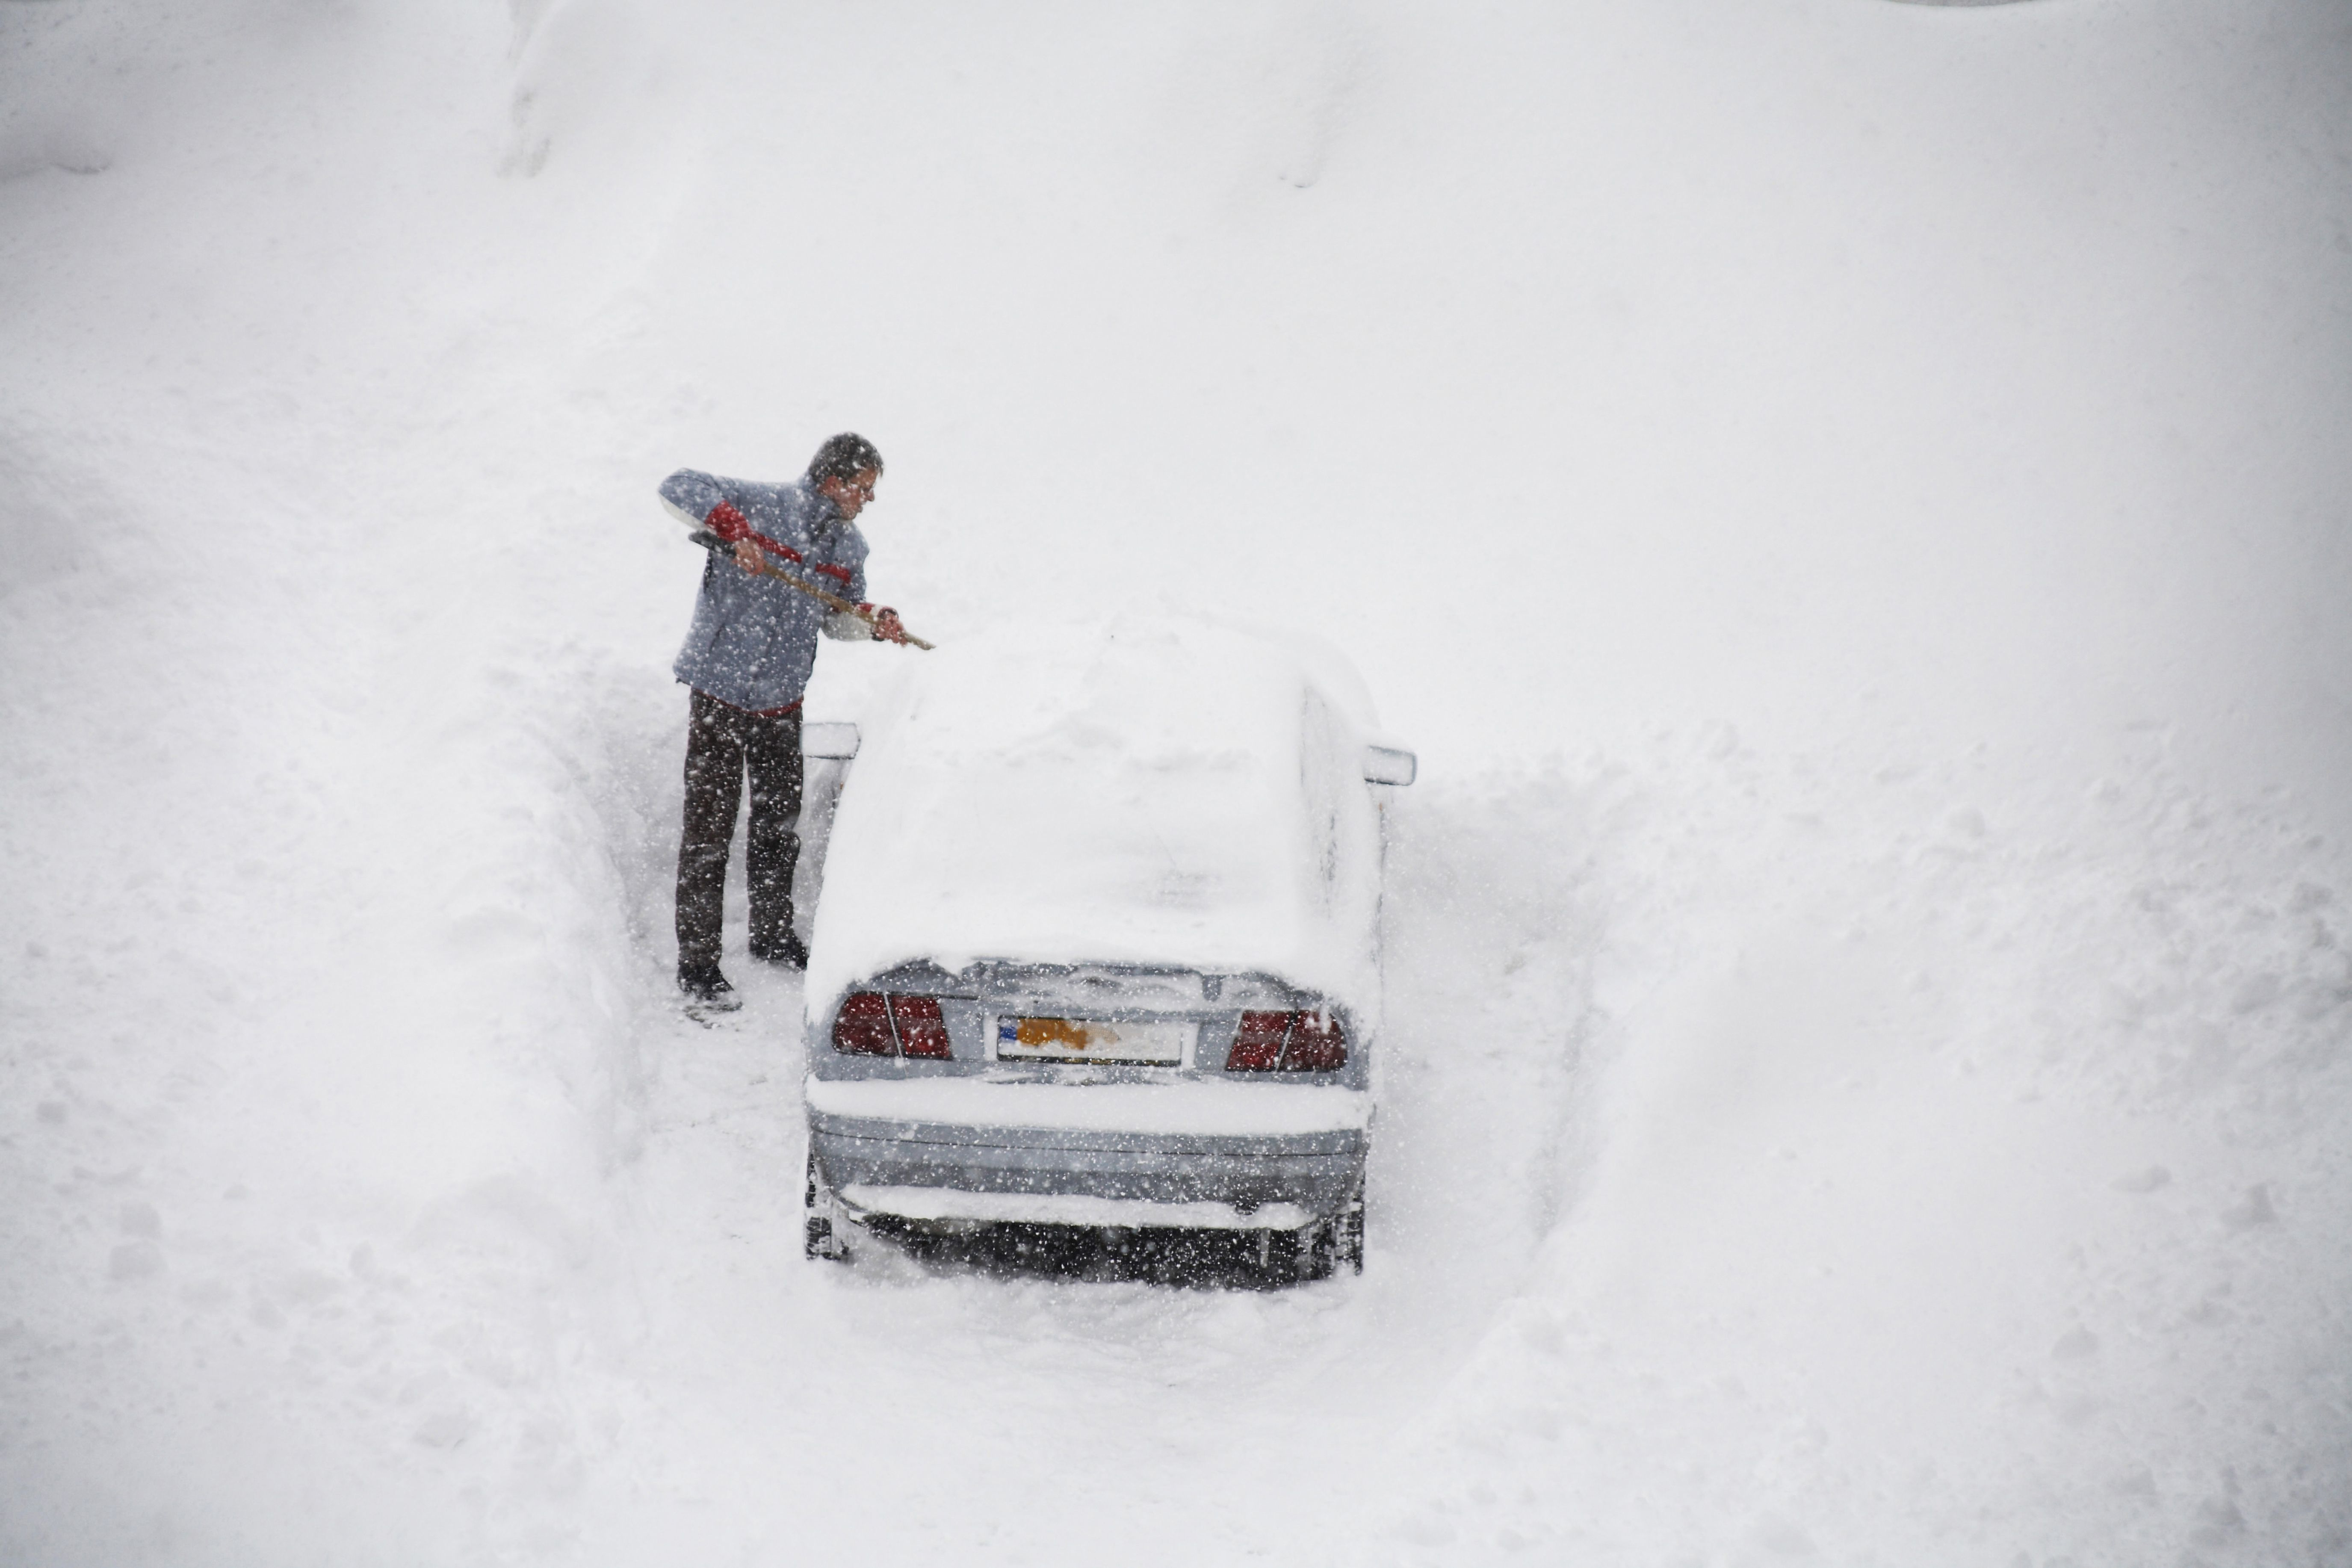 Farmers\' Almanac Winter 2019 Weather Forecast: Cold, Snowy Winter